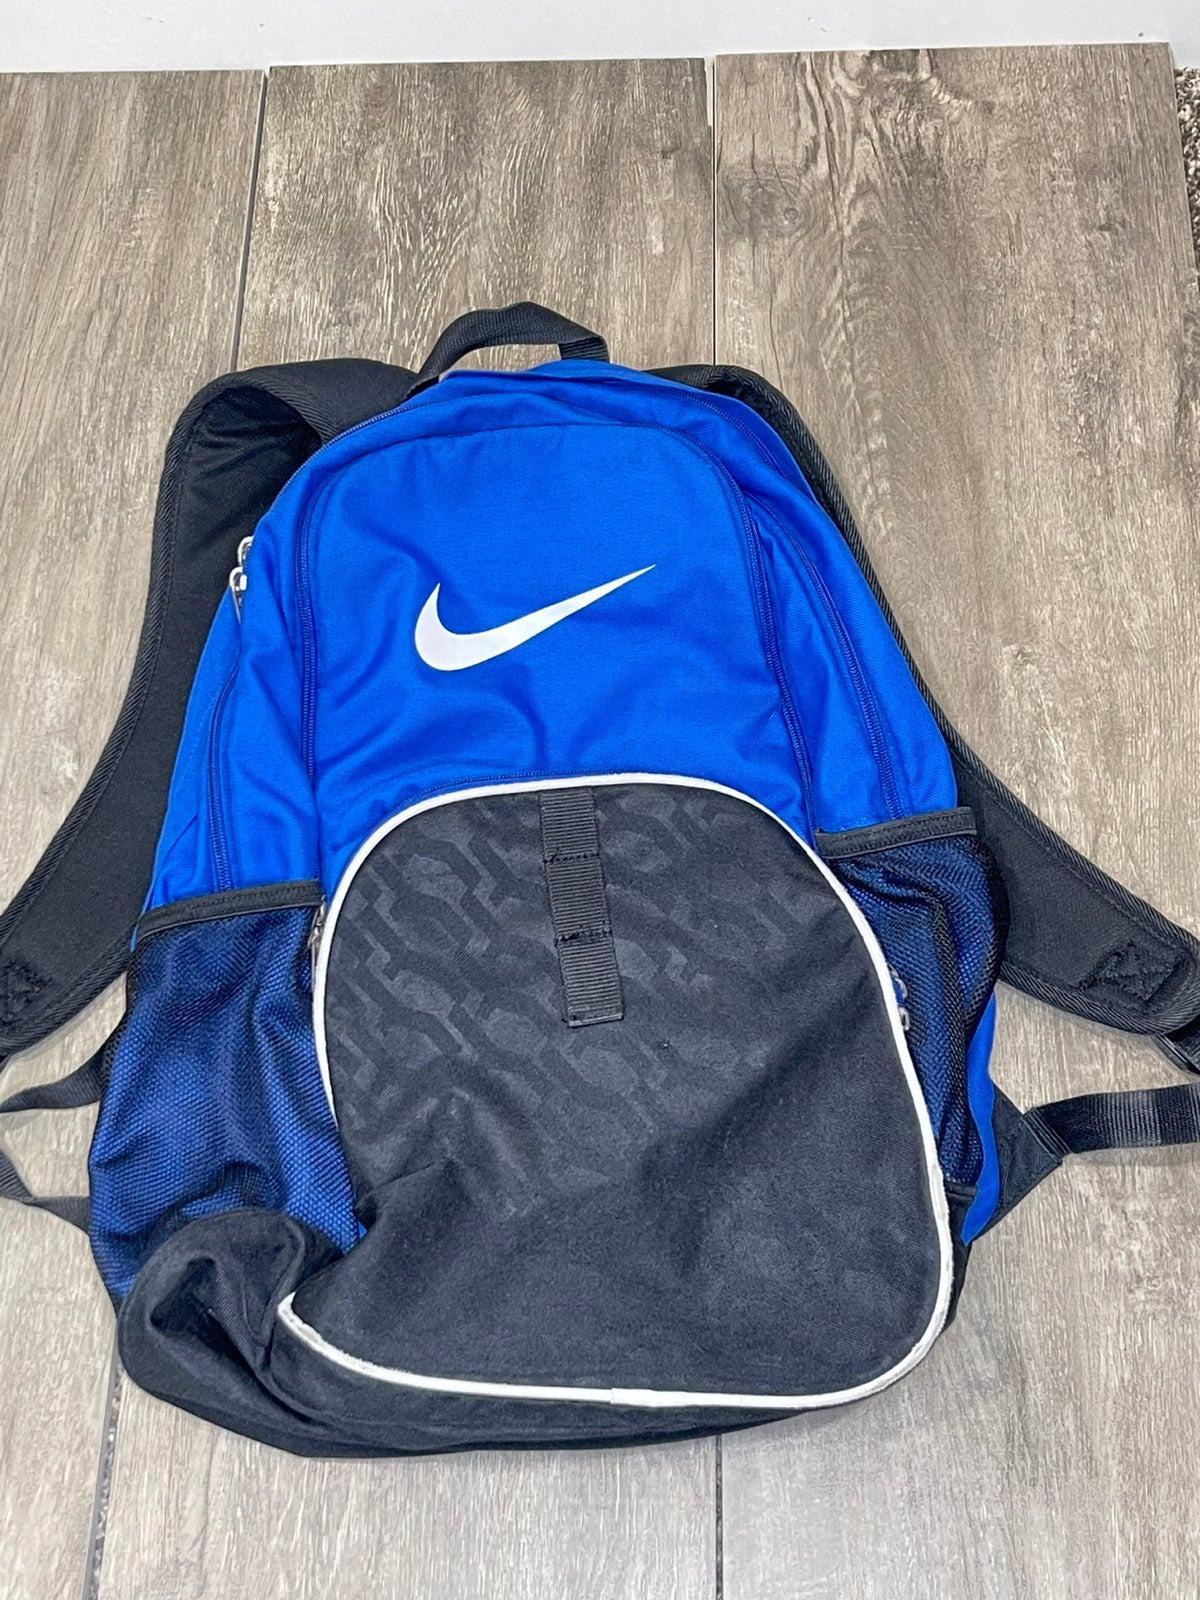 Nike School Backpack Book Bag Travel